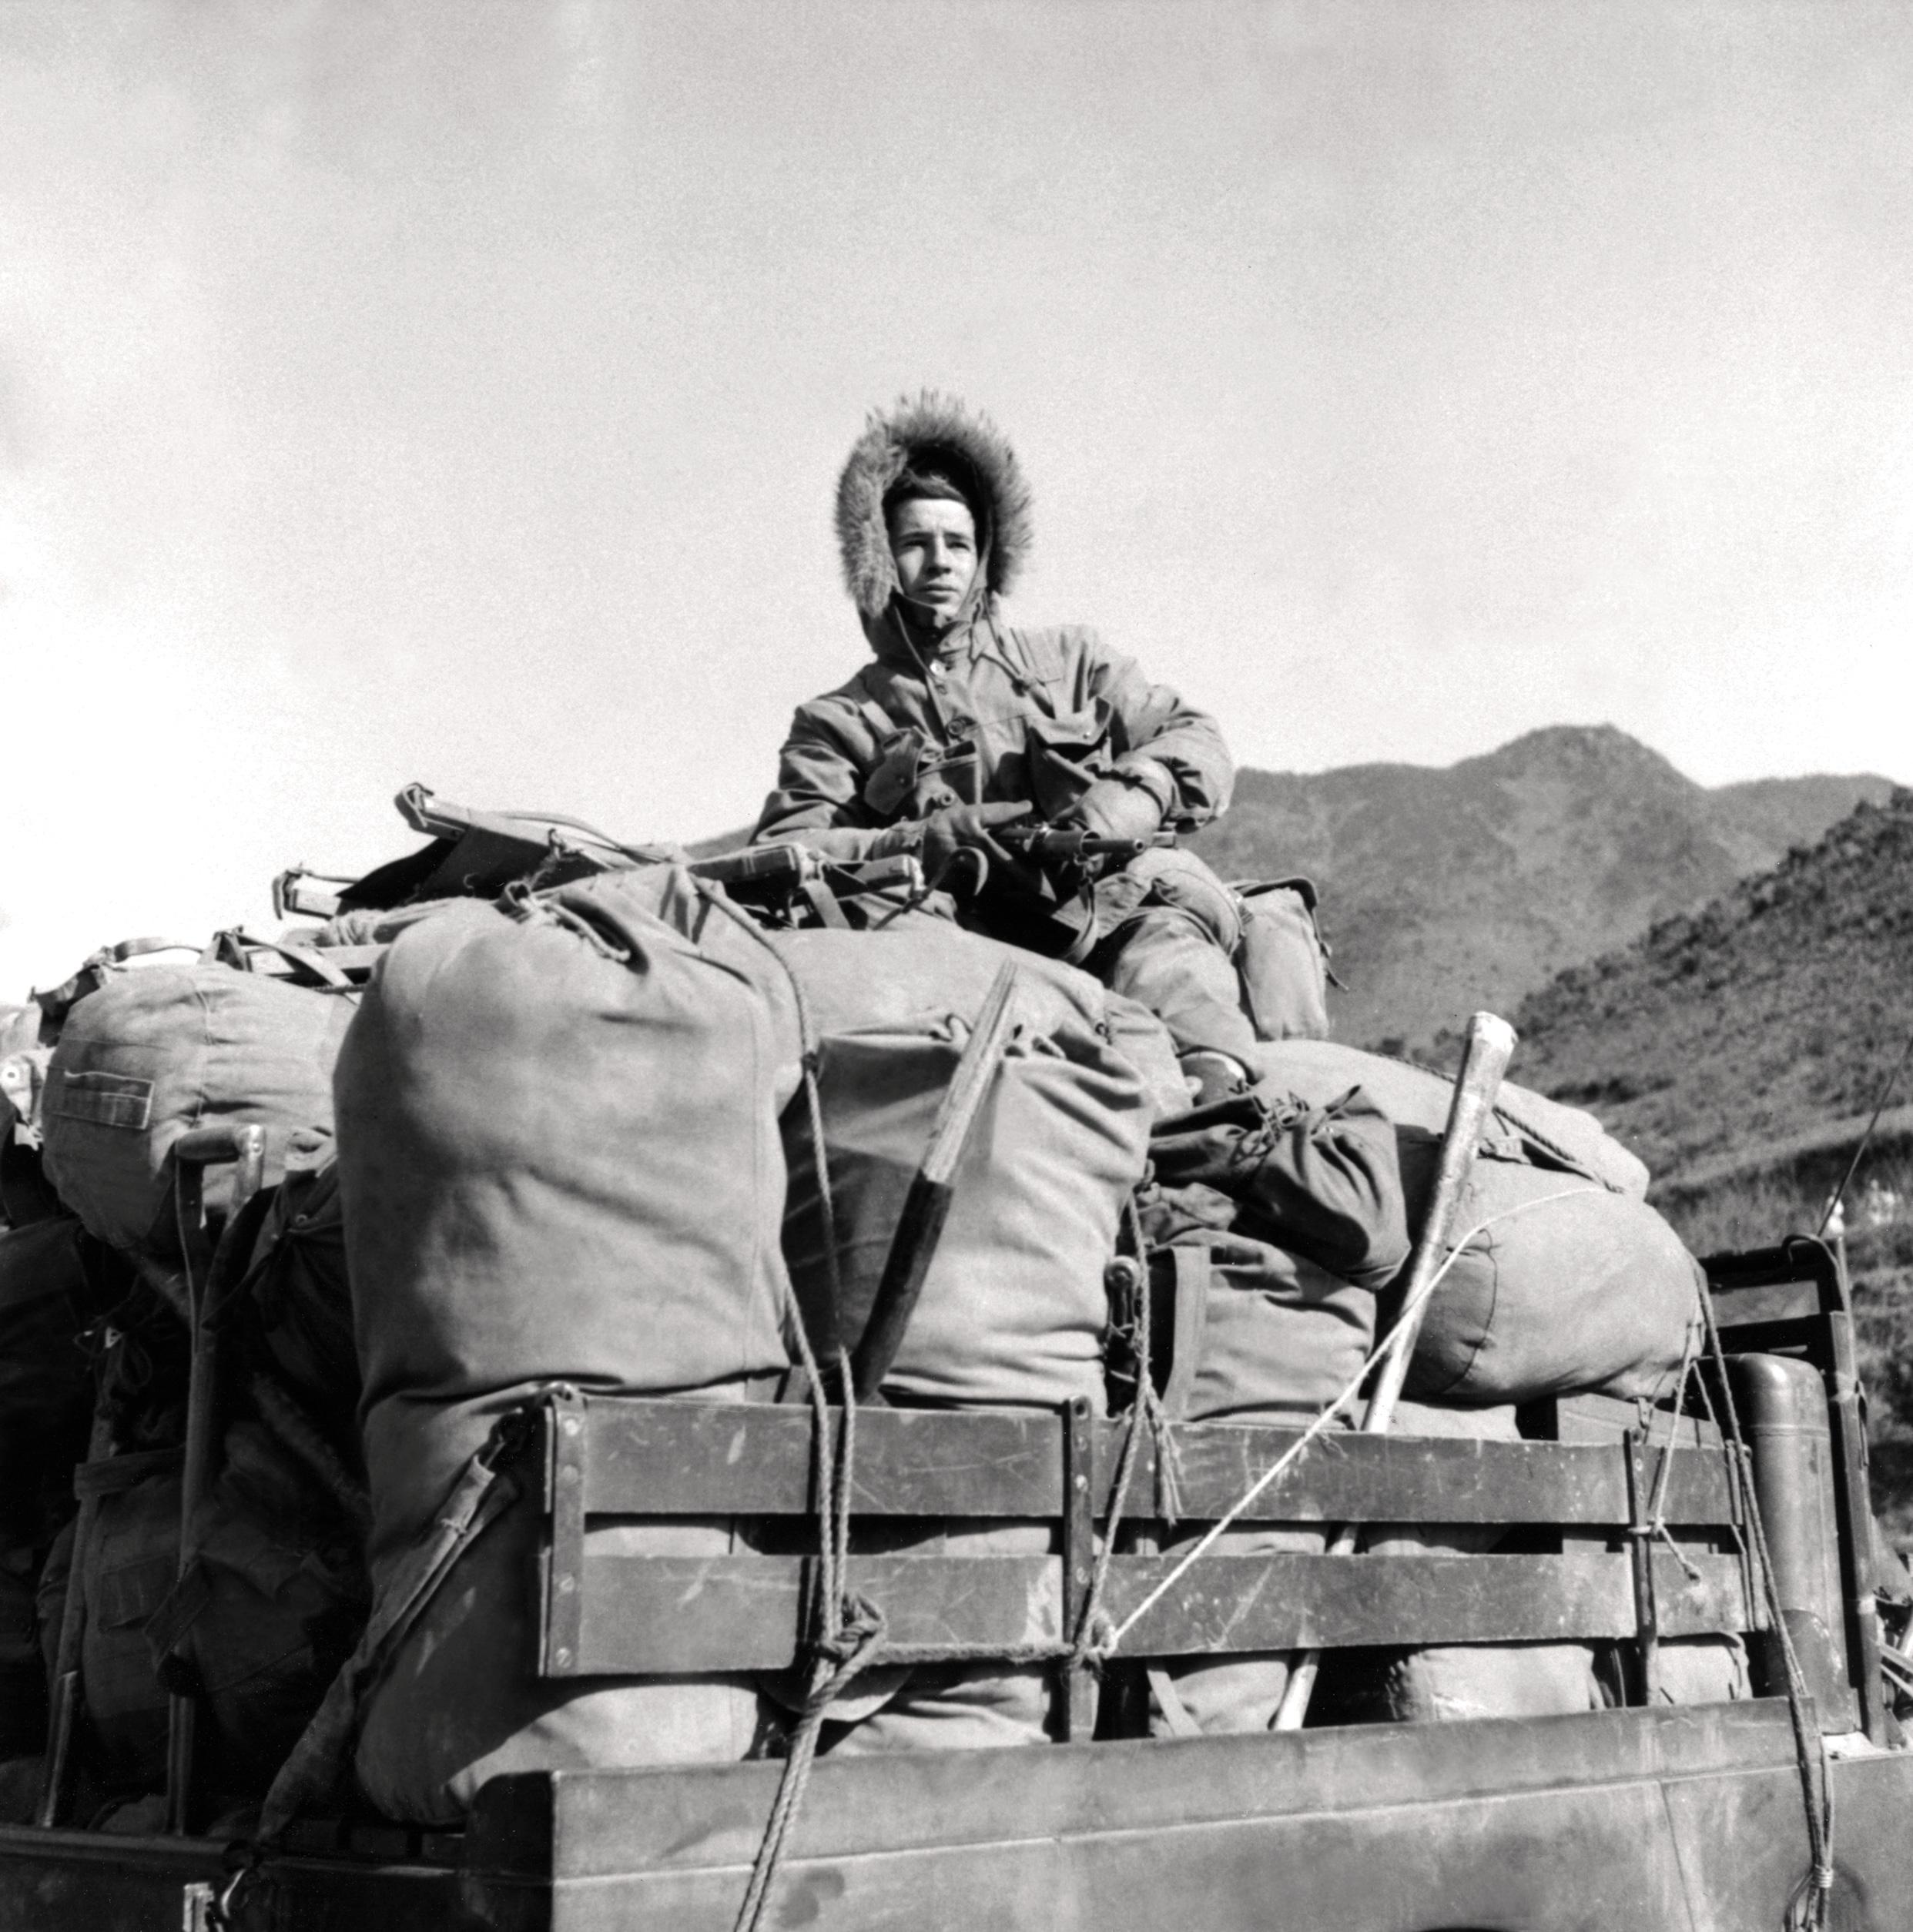 Historic Korean War Photo – Watching For Enemy Movement